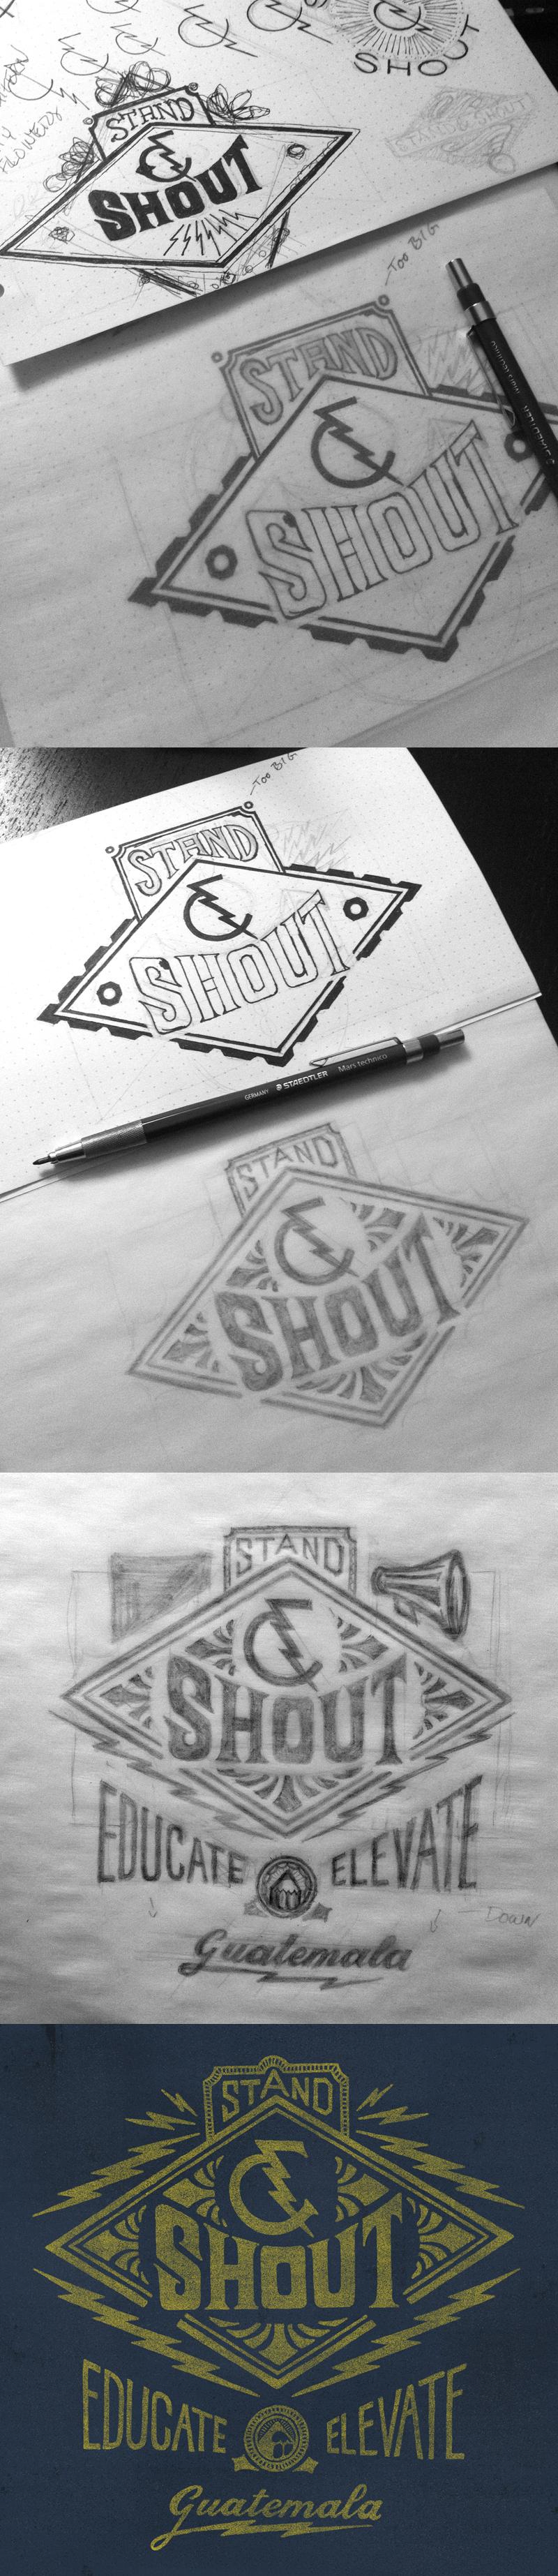 Stand shout process